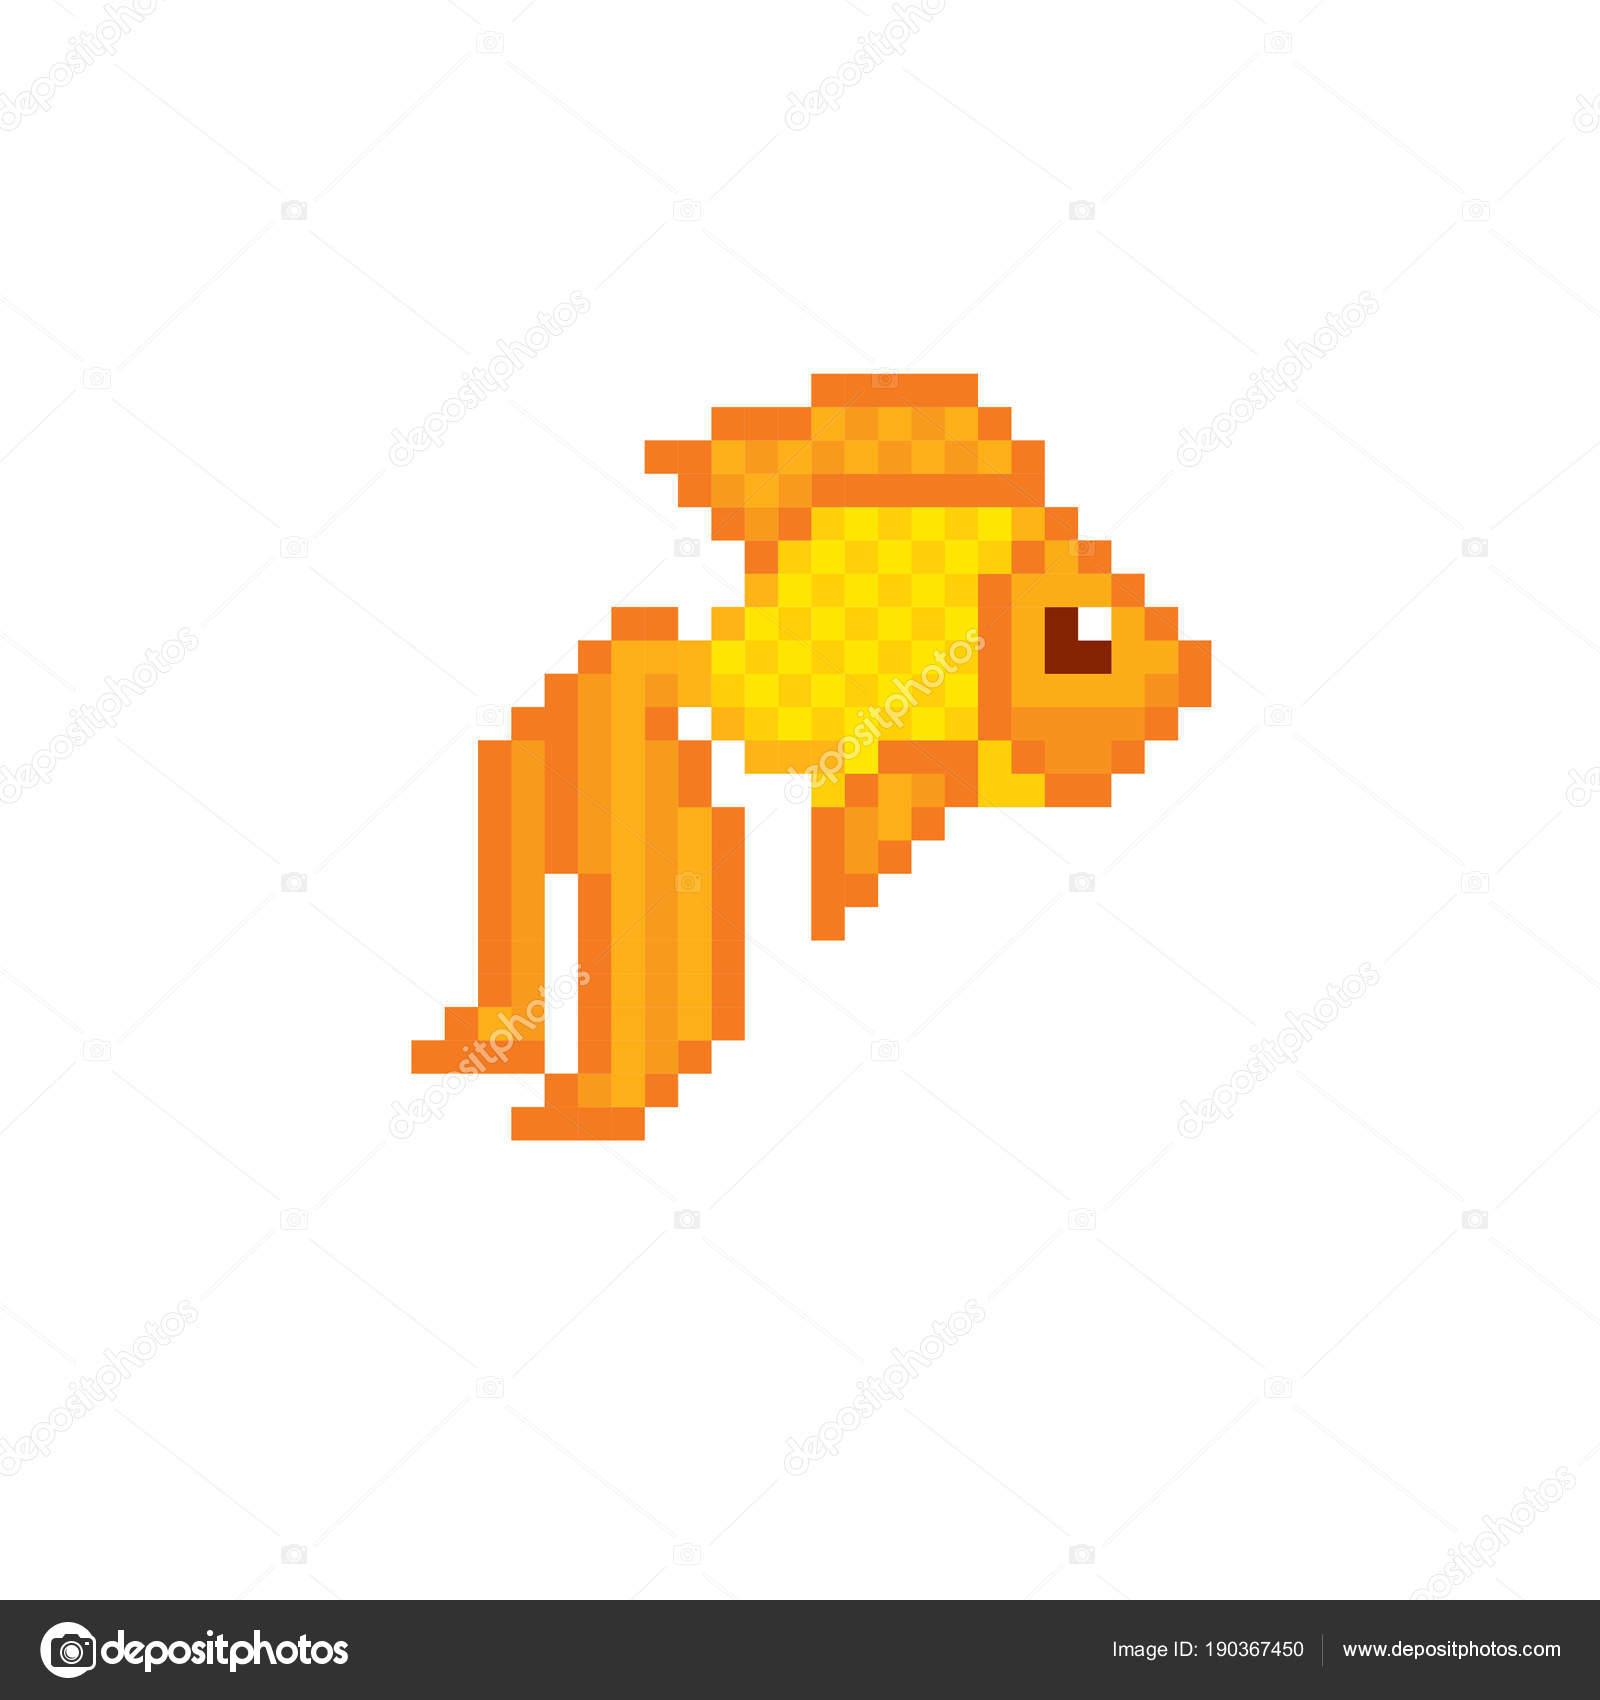 Gold Fish Pixel Icon Pixel Art Old School Computer Graphic 8 Bit